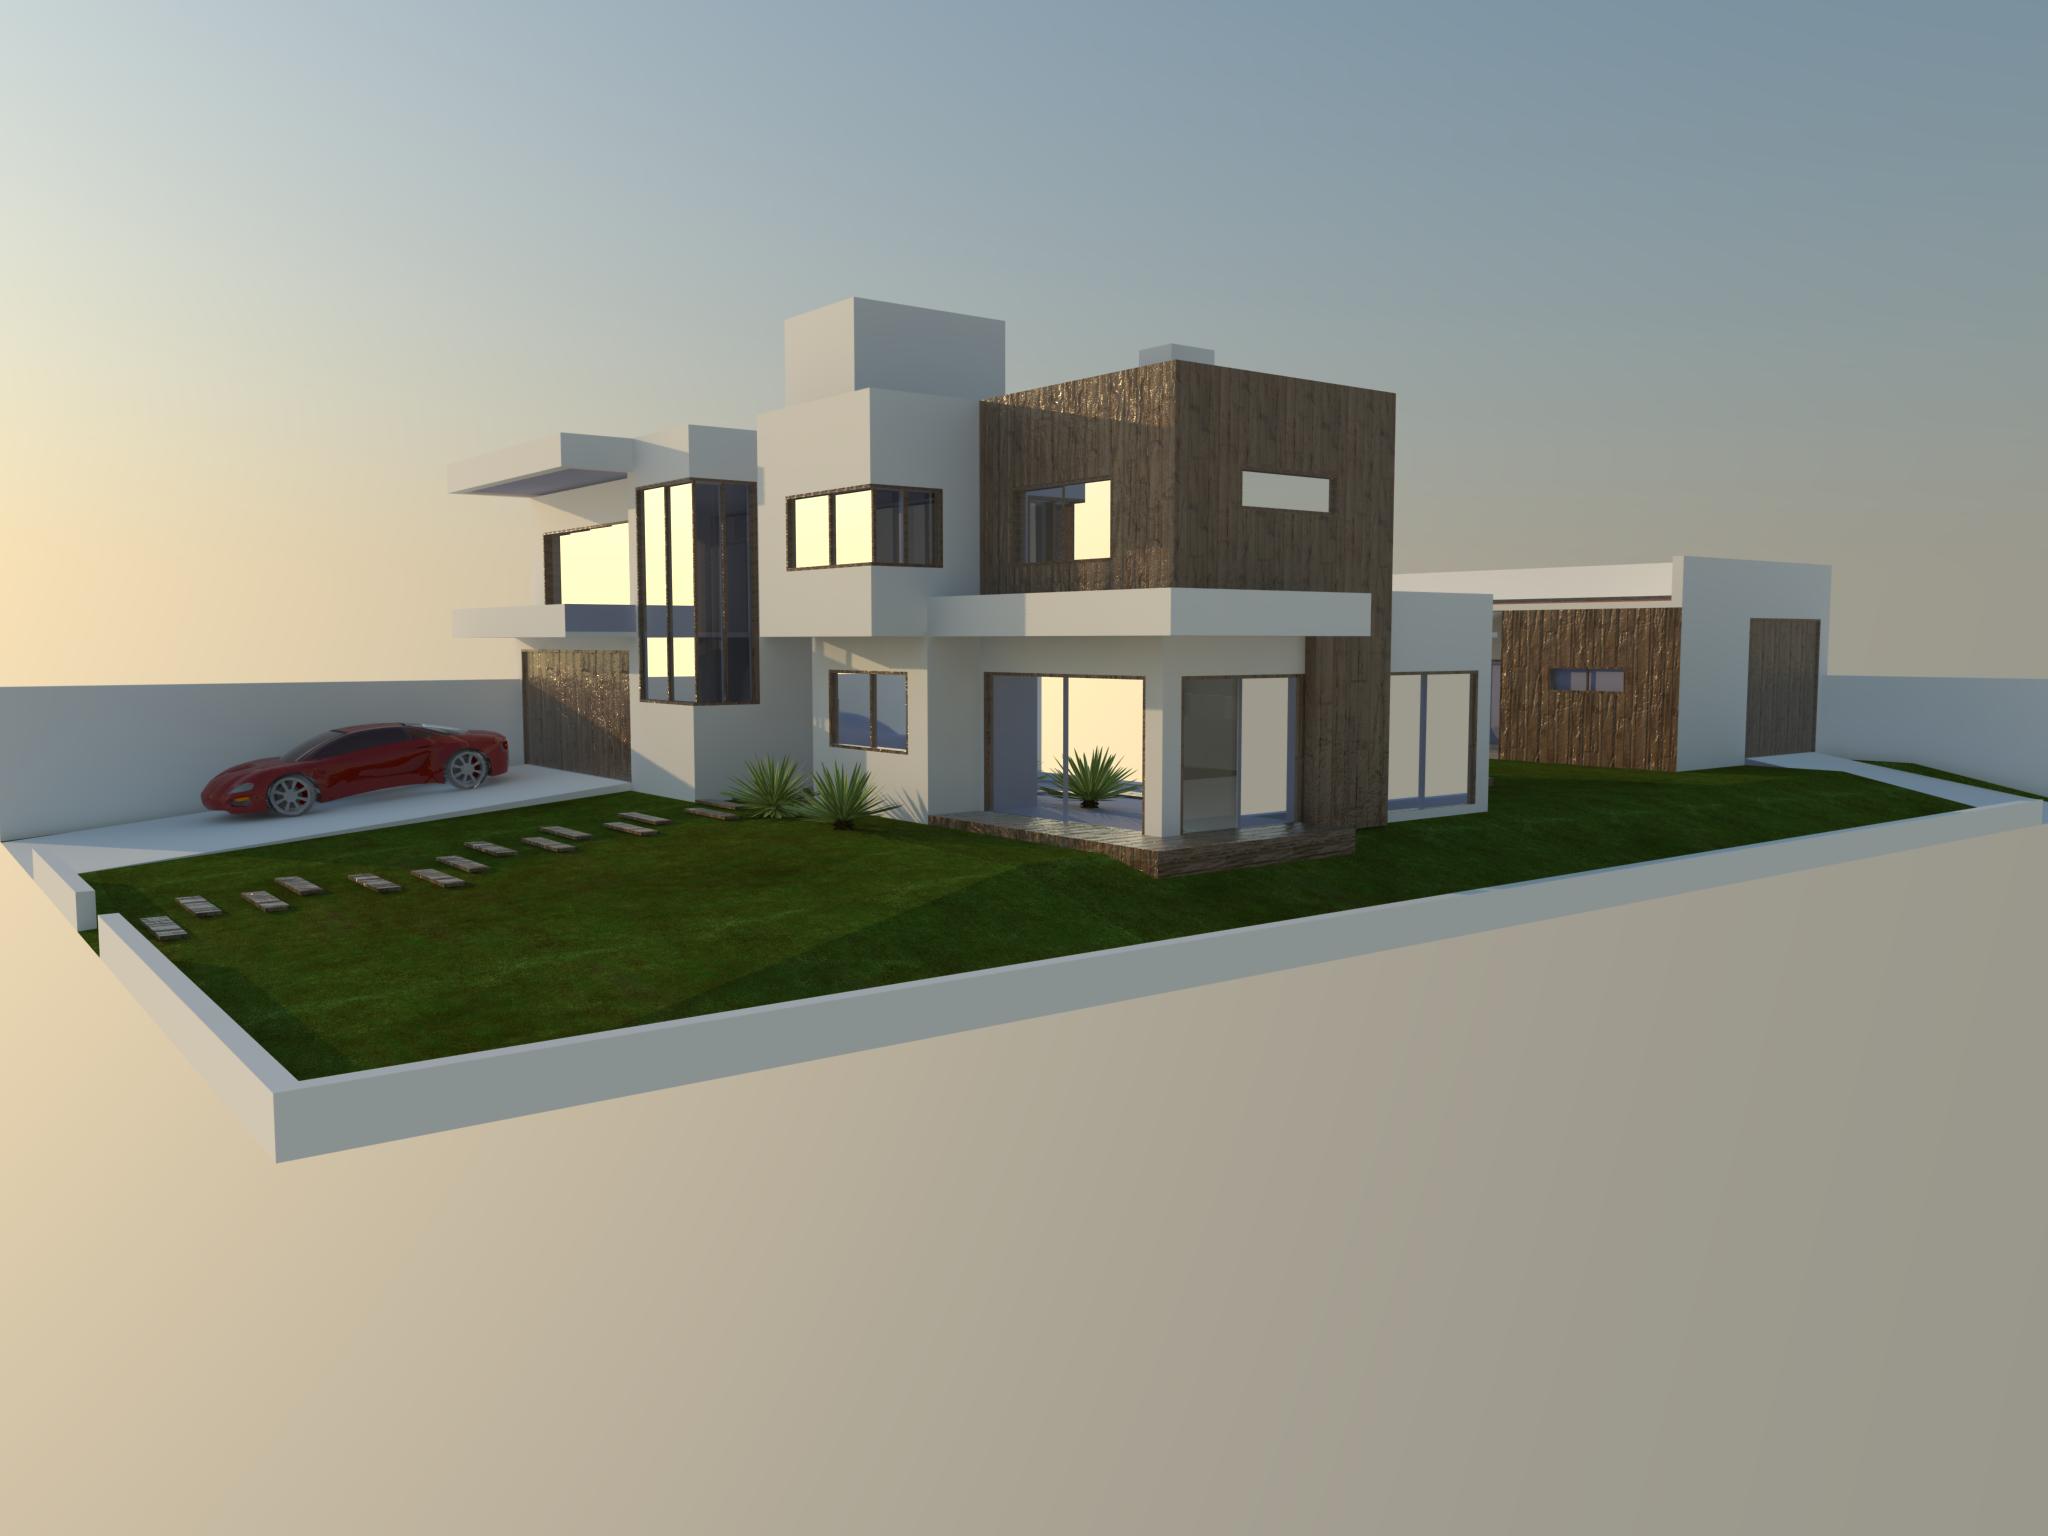 Unifamiliar Residential Project Residencia Unifamiliar Jessica Bohmer Architecture Modelling